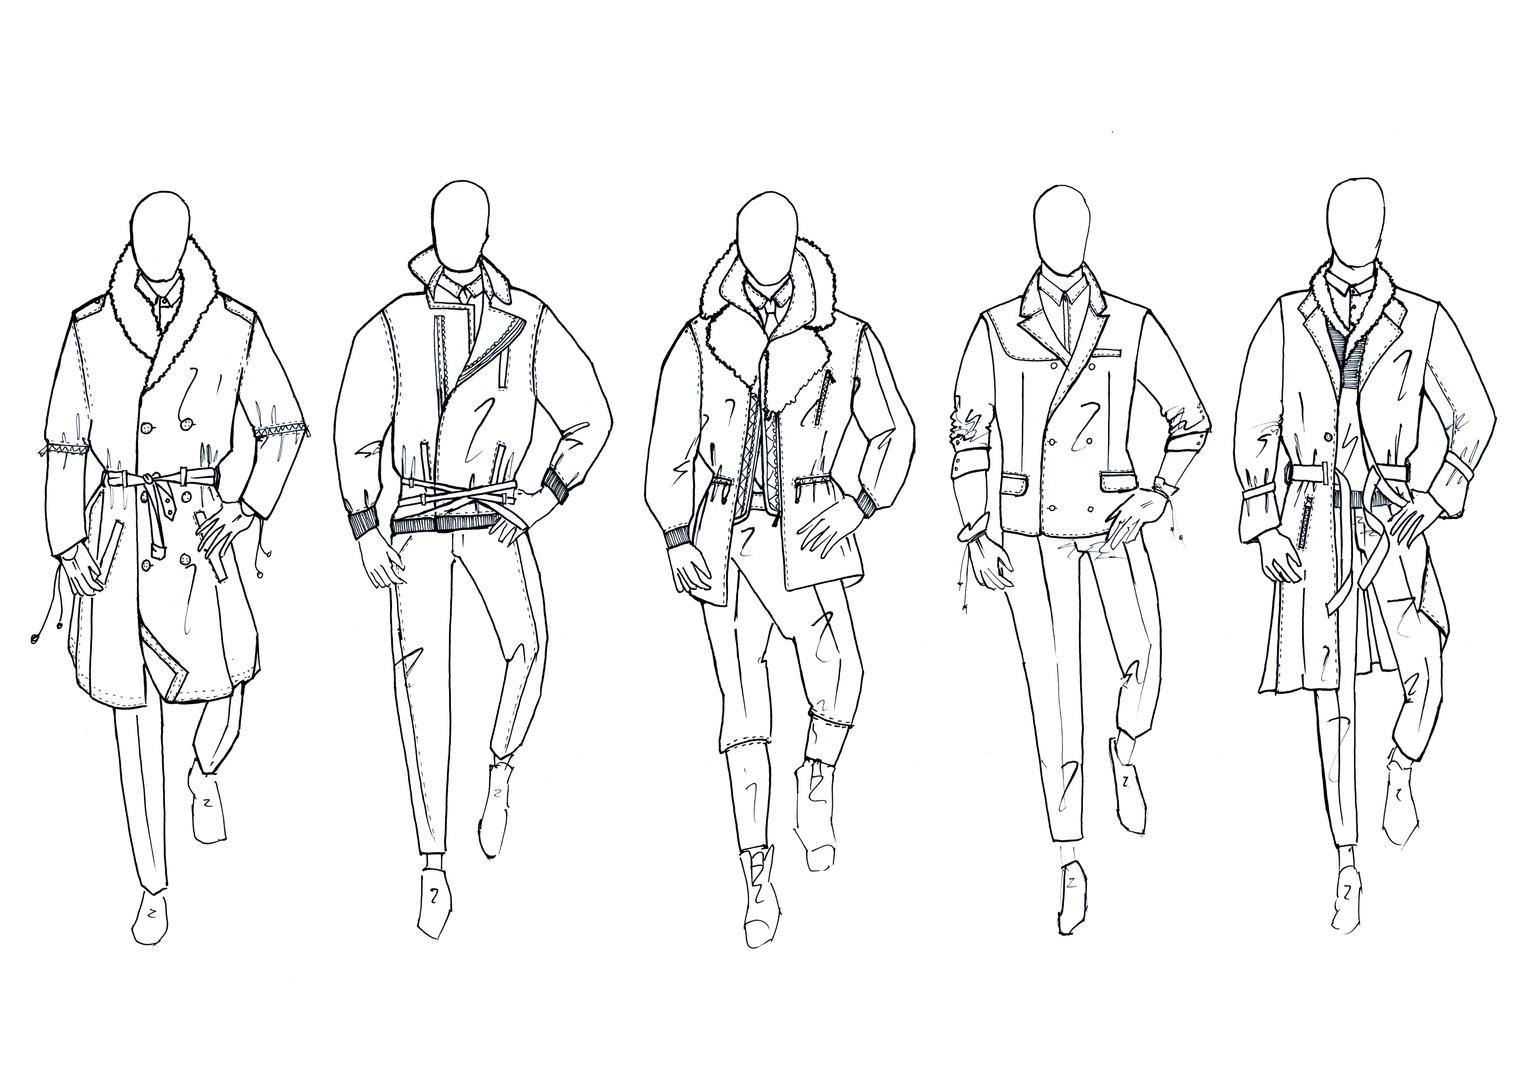 Detailed garment sketch